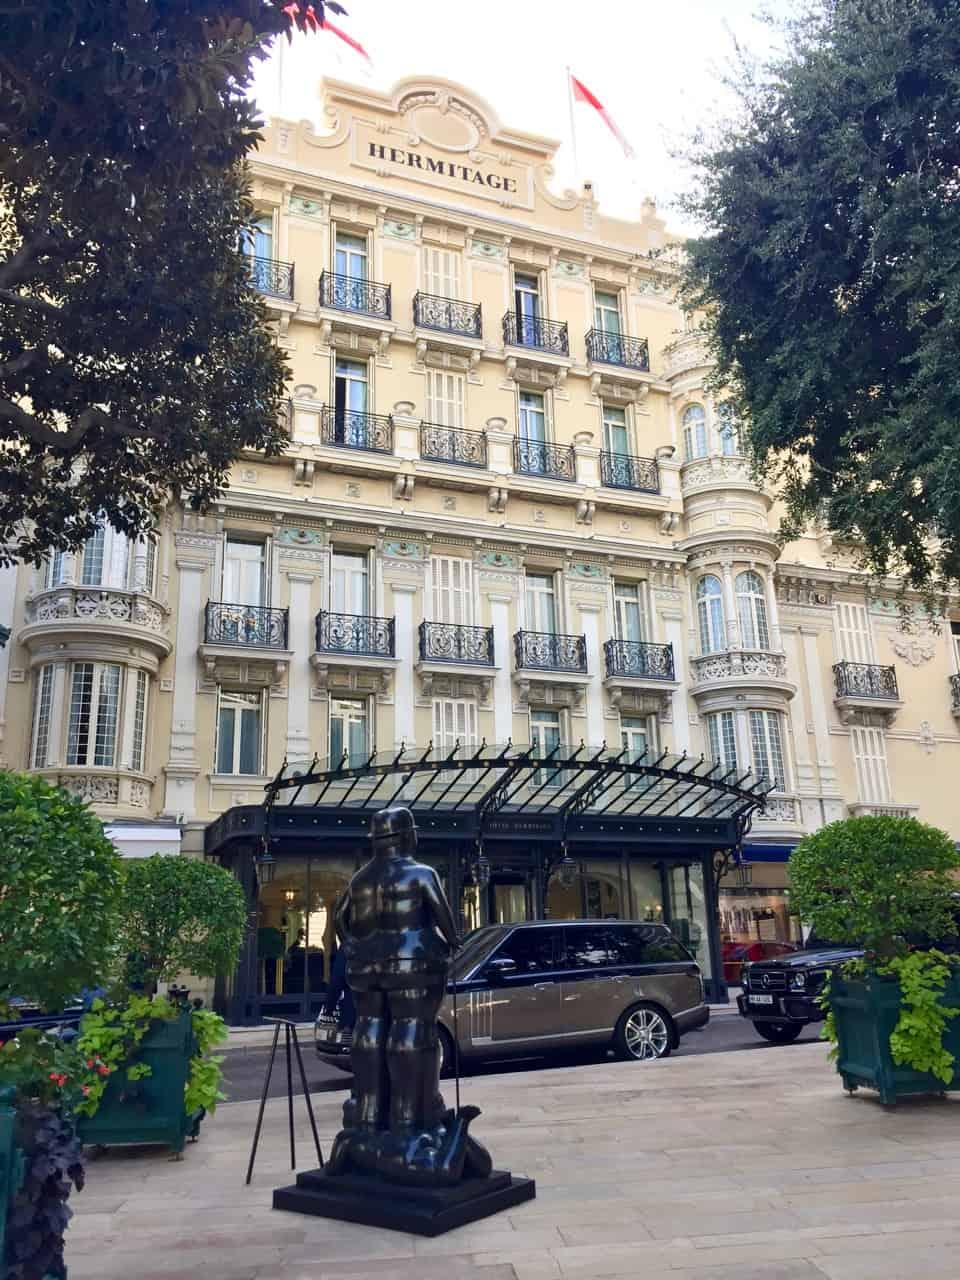 hotel-hermitage-monte-carlo-photo